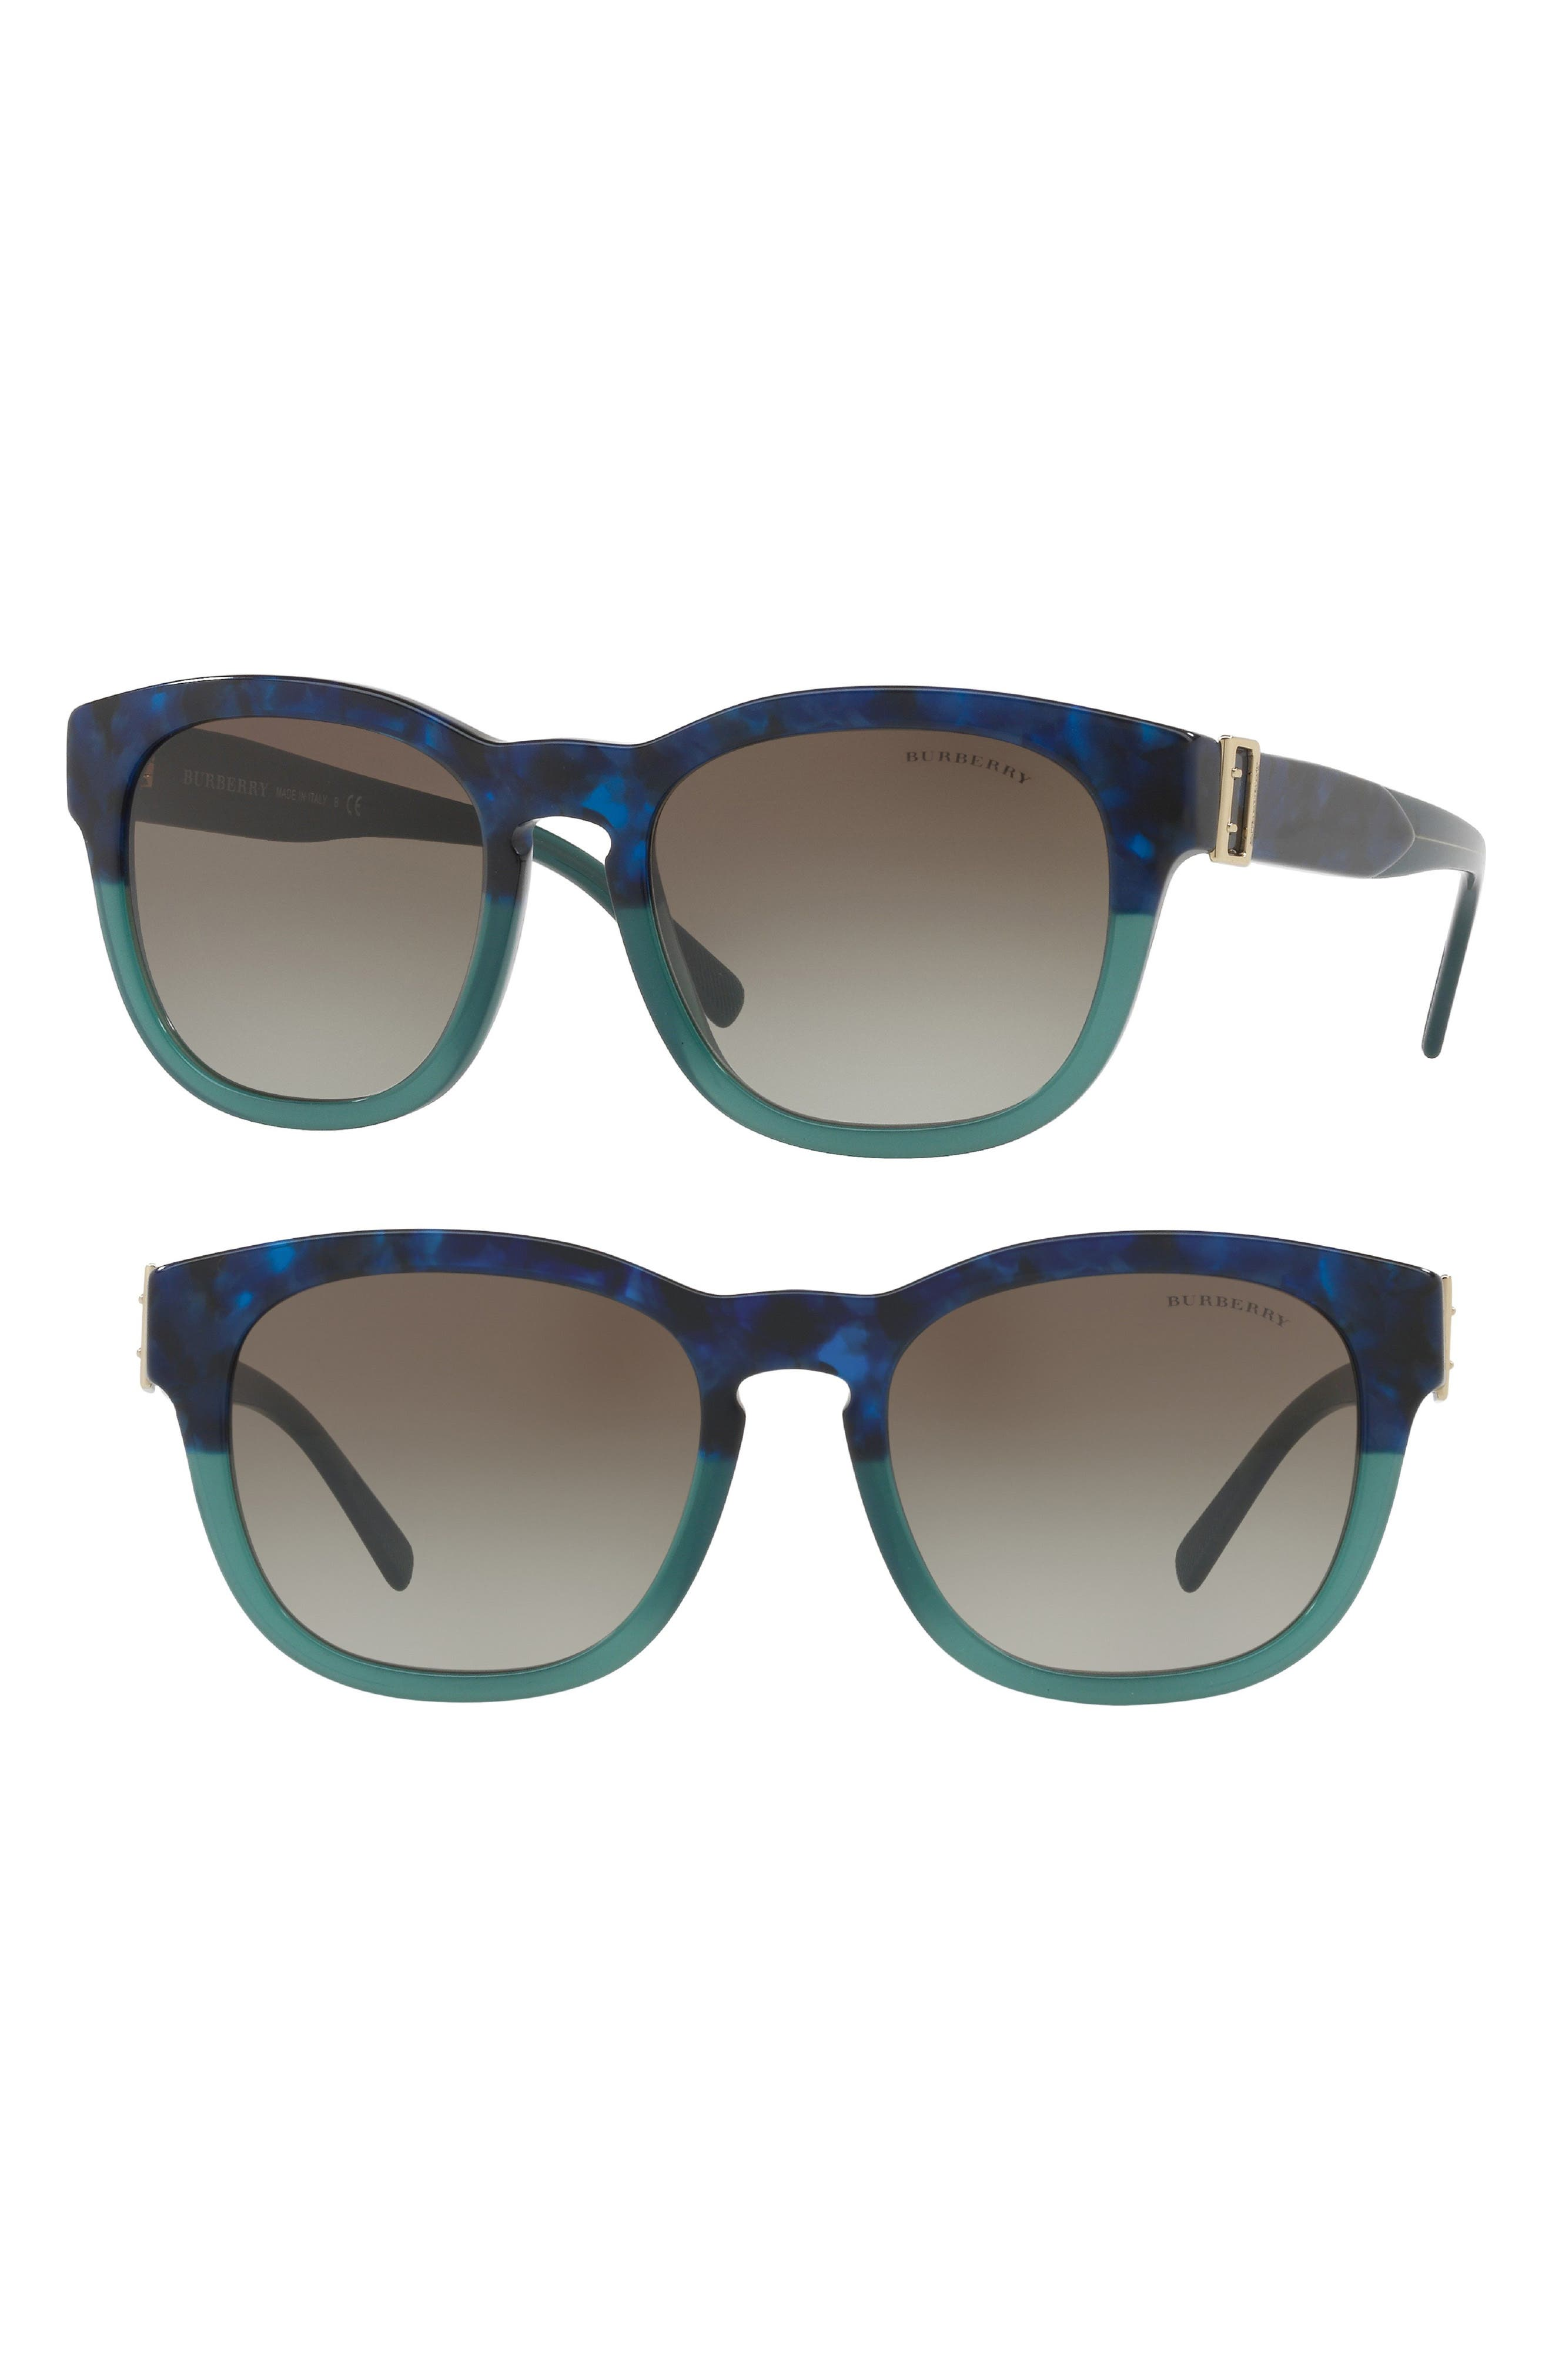 fe85112ac61 Burberry 54Mm Cat Eye Sunglasses - Blue Havana